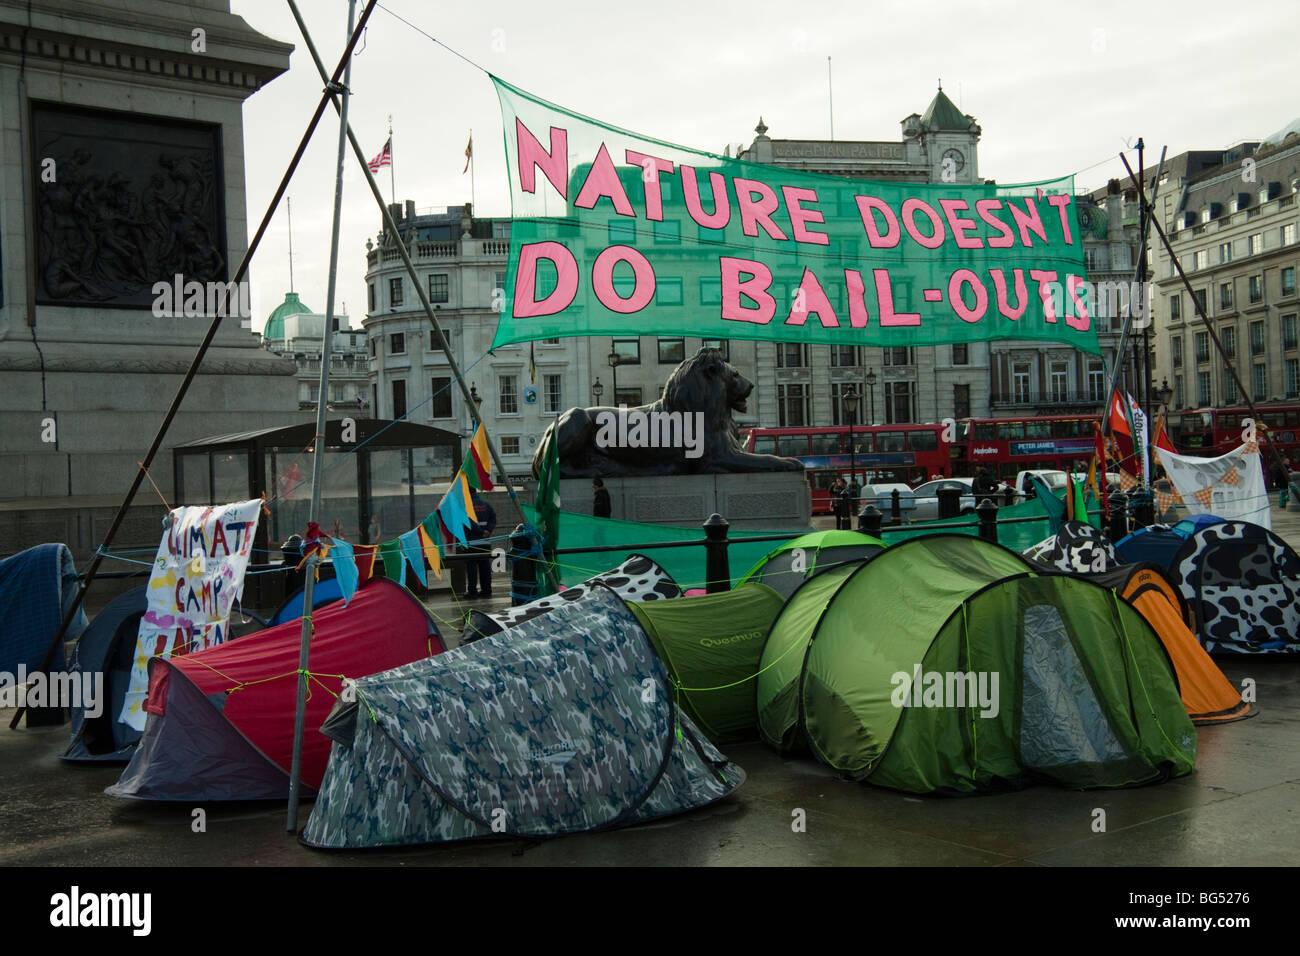 Climate change protestors at climatecamp, Trafalgar Square, London, England, UK - Stock Image